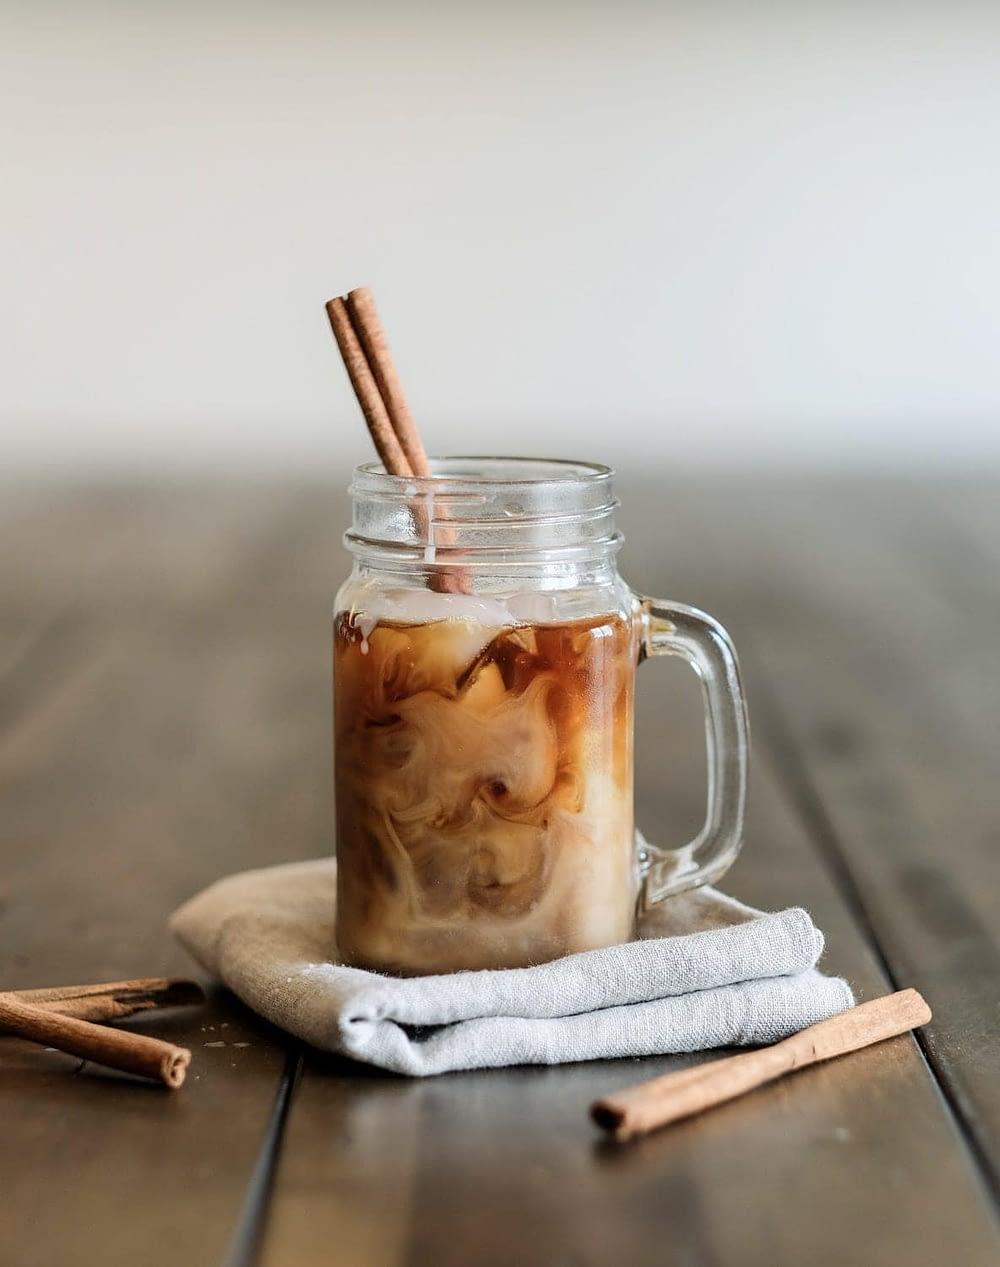 cold brew coffee in a mason jar with a cinnamon stick